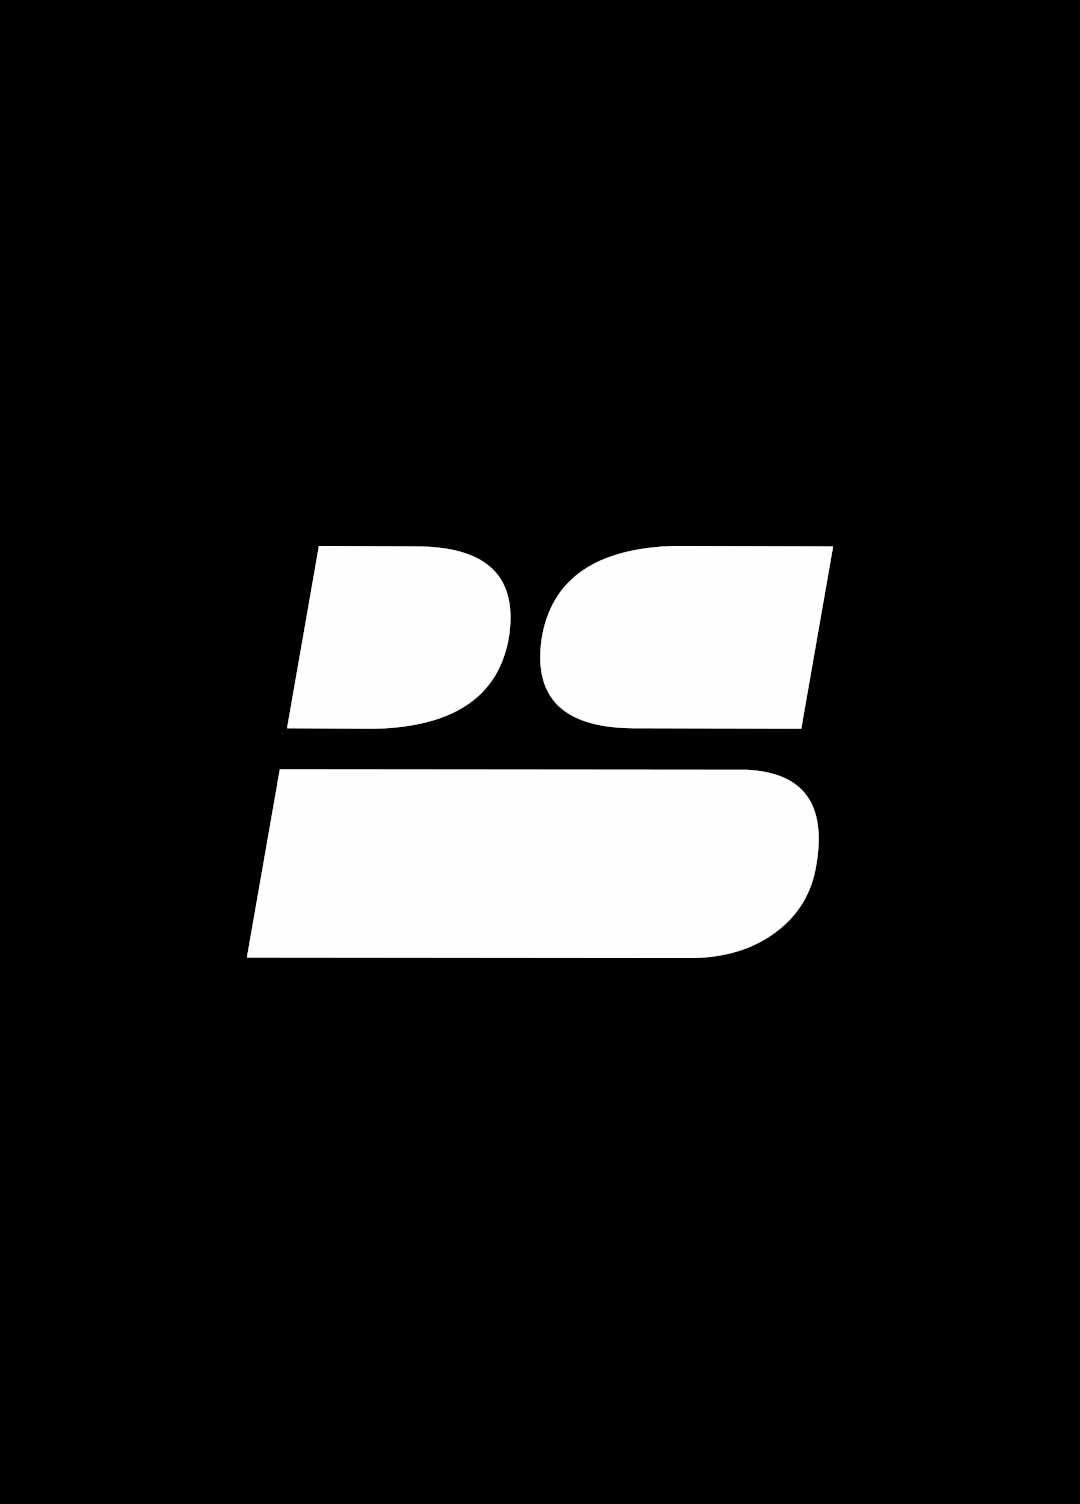 Burban Studios Maximera din närvaro online